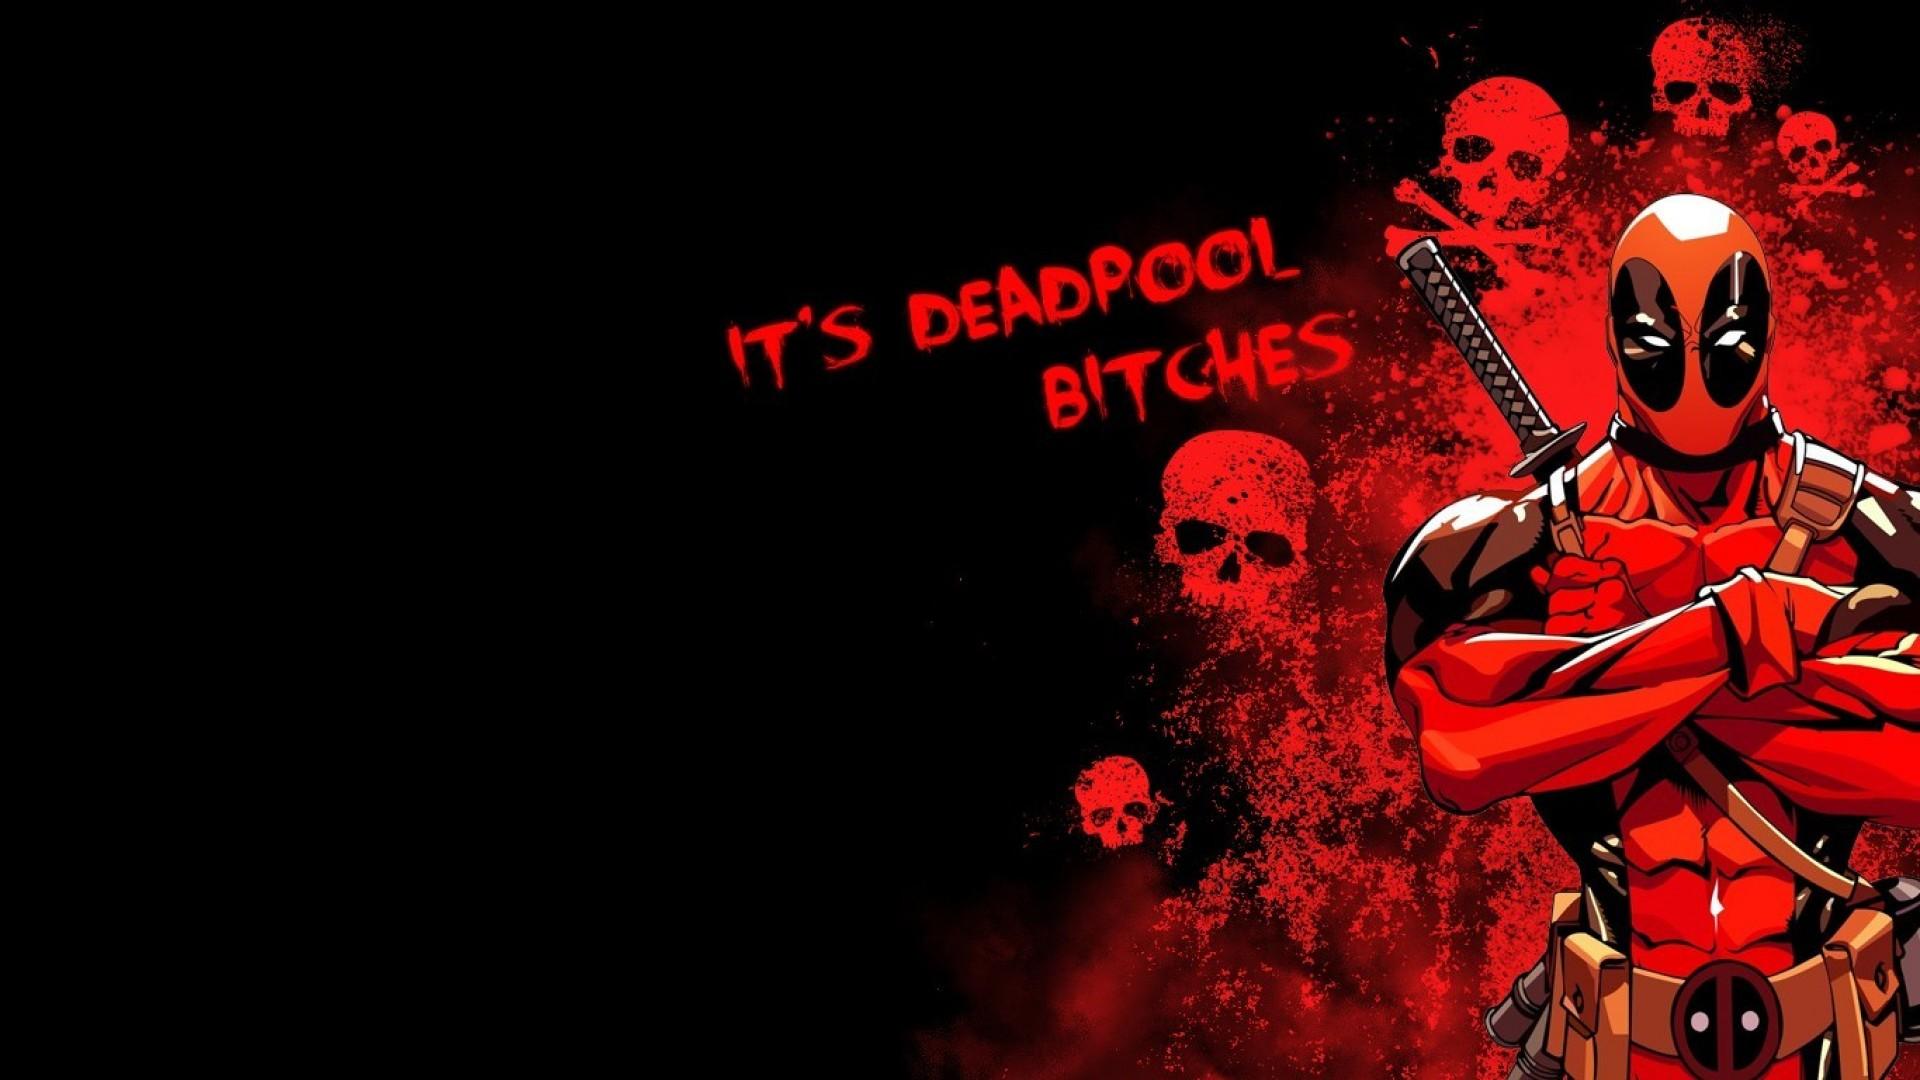 Deadpool Wallpaper HD 63bud7go   Yoanucom 1920x1080